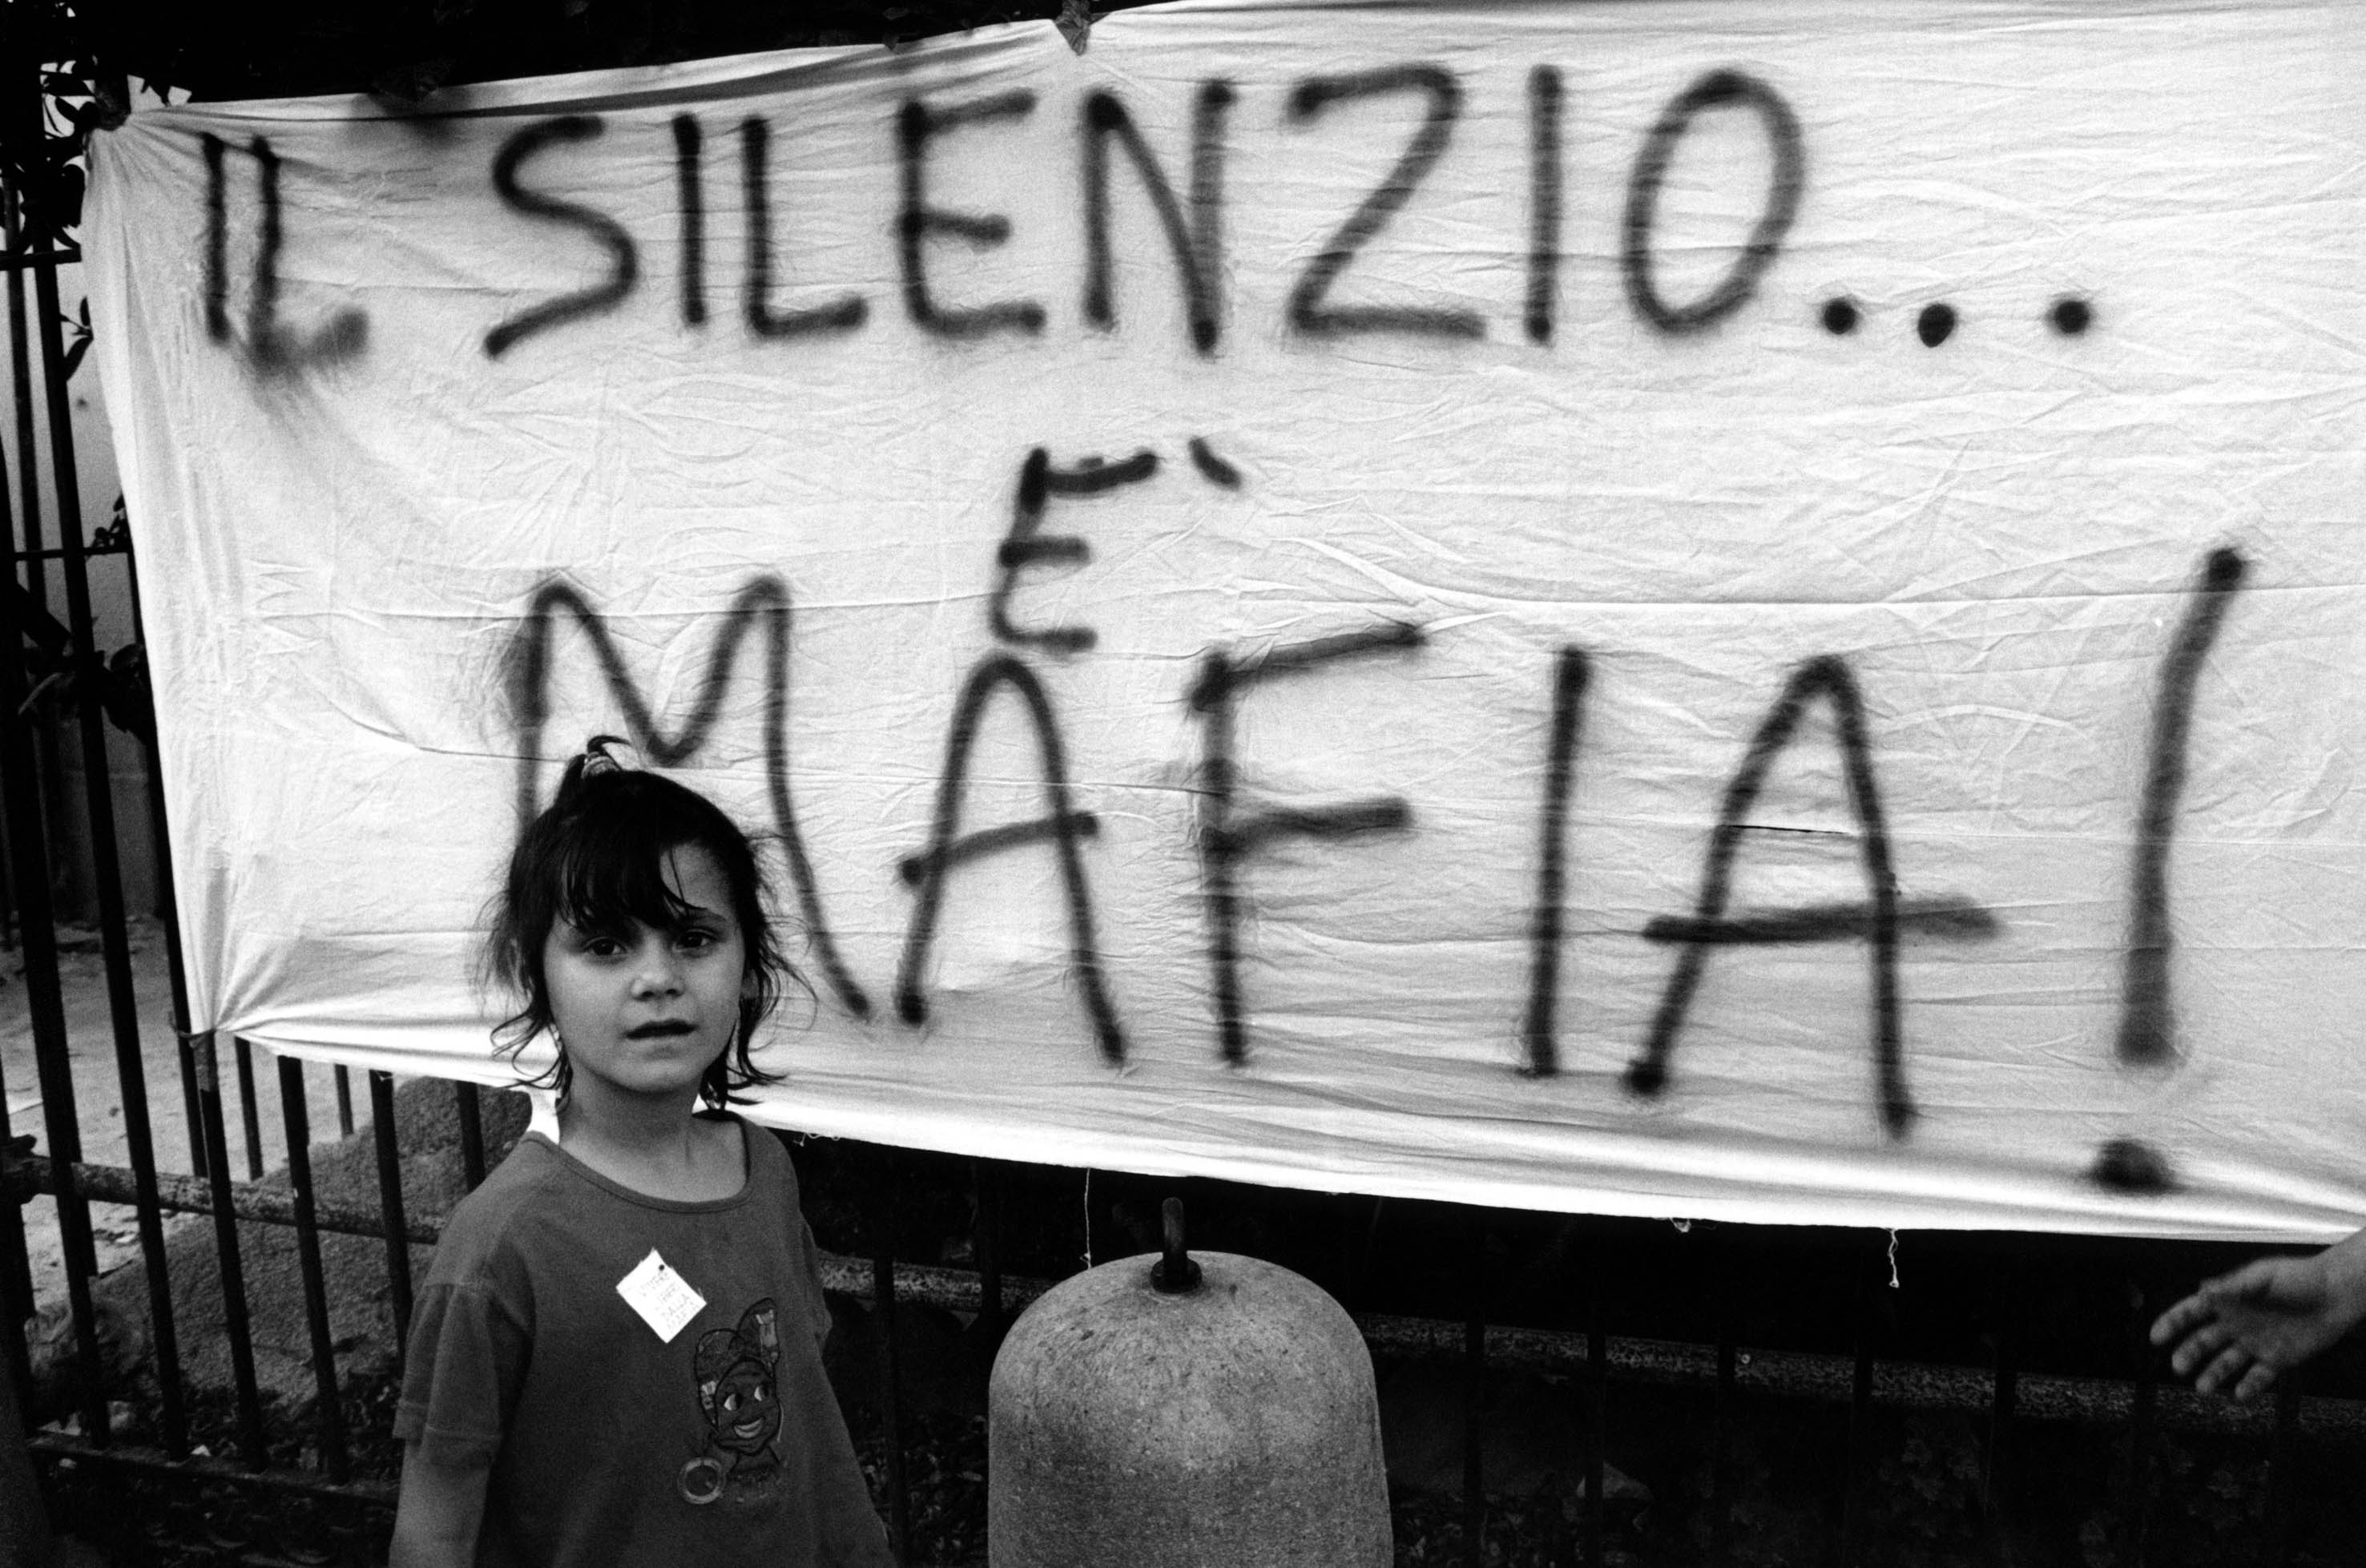 Lenzuoli contro la mafia. Palermo, 1993. © Shobha-Contrasto